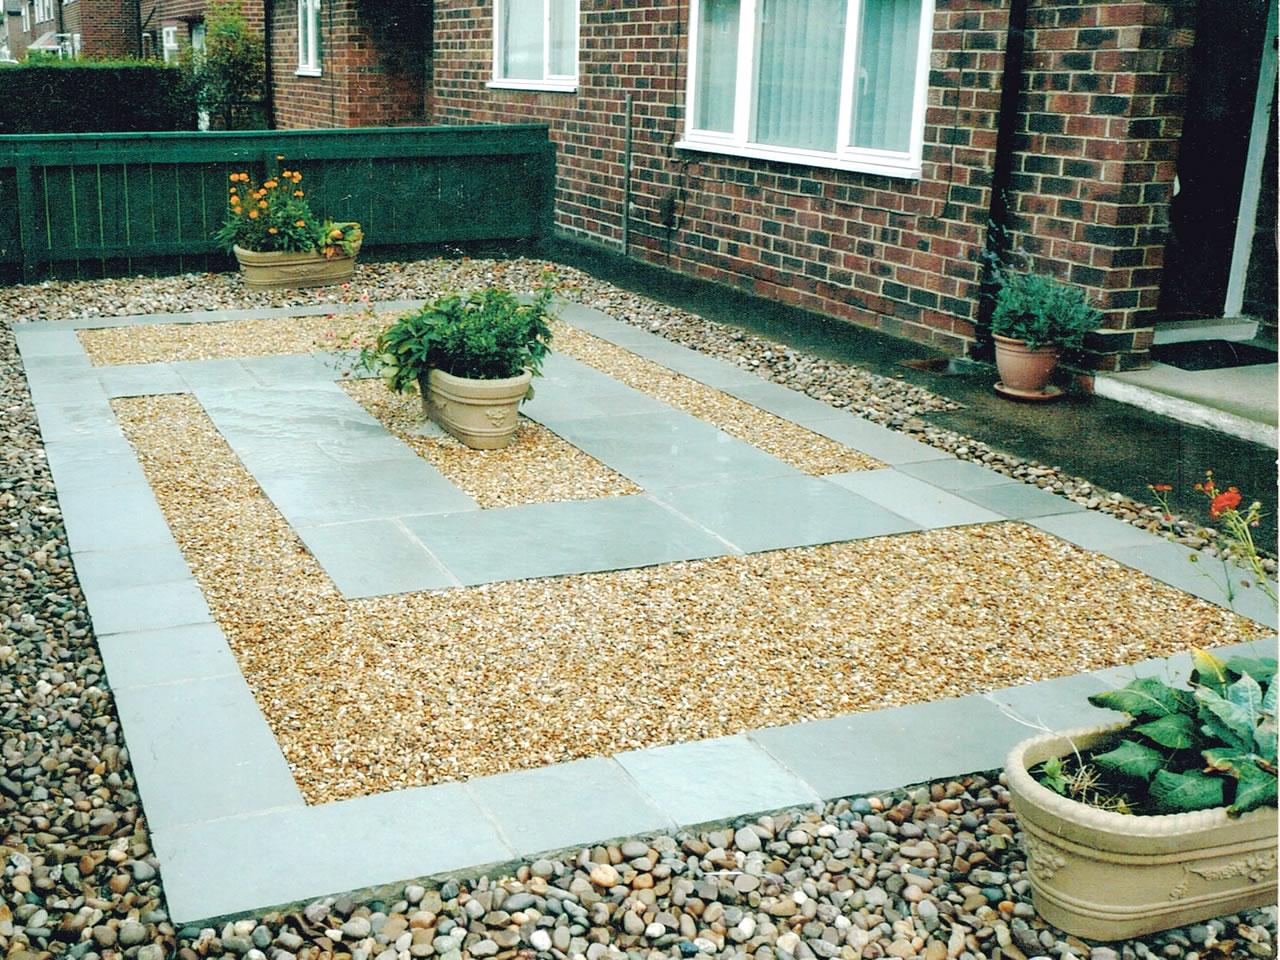 Gravel Gardens, Low Maintenance And Non Maintenance Gardens